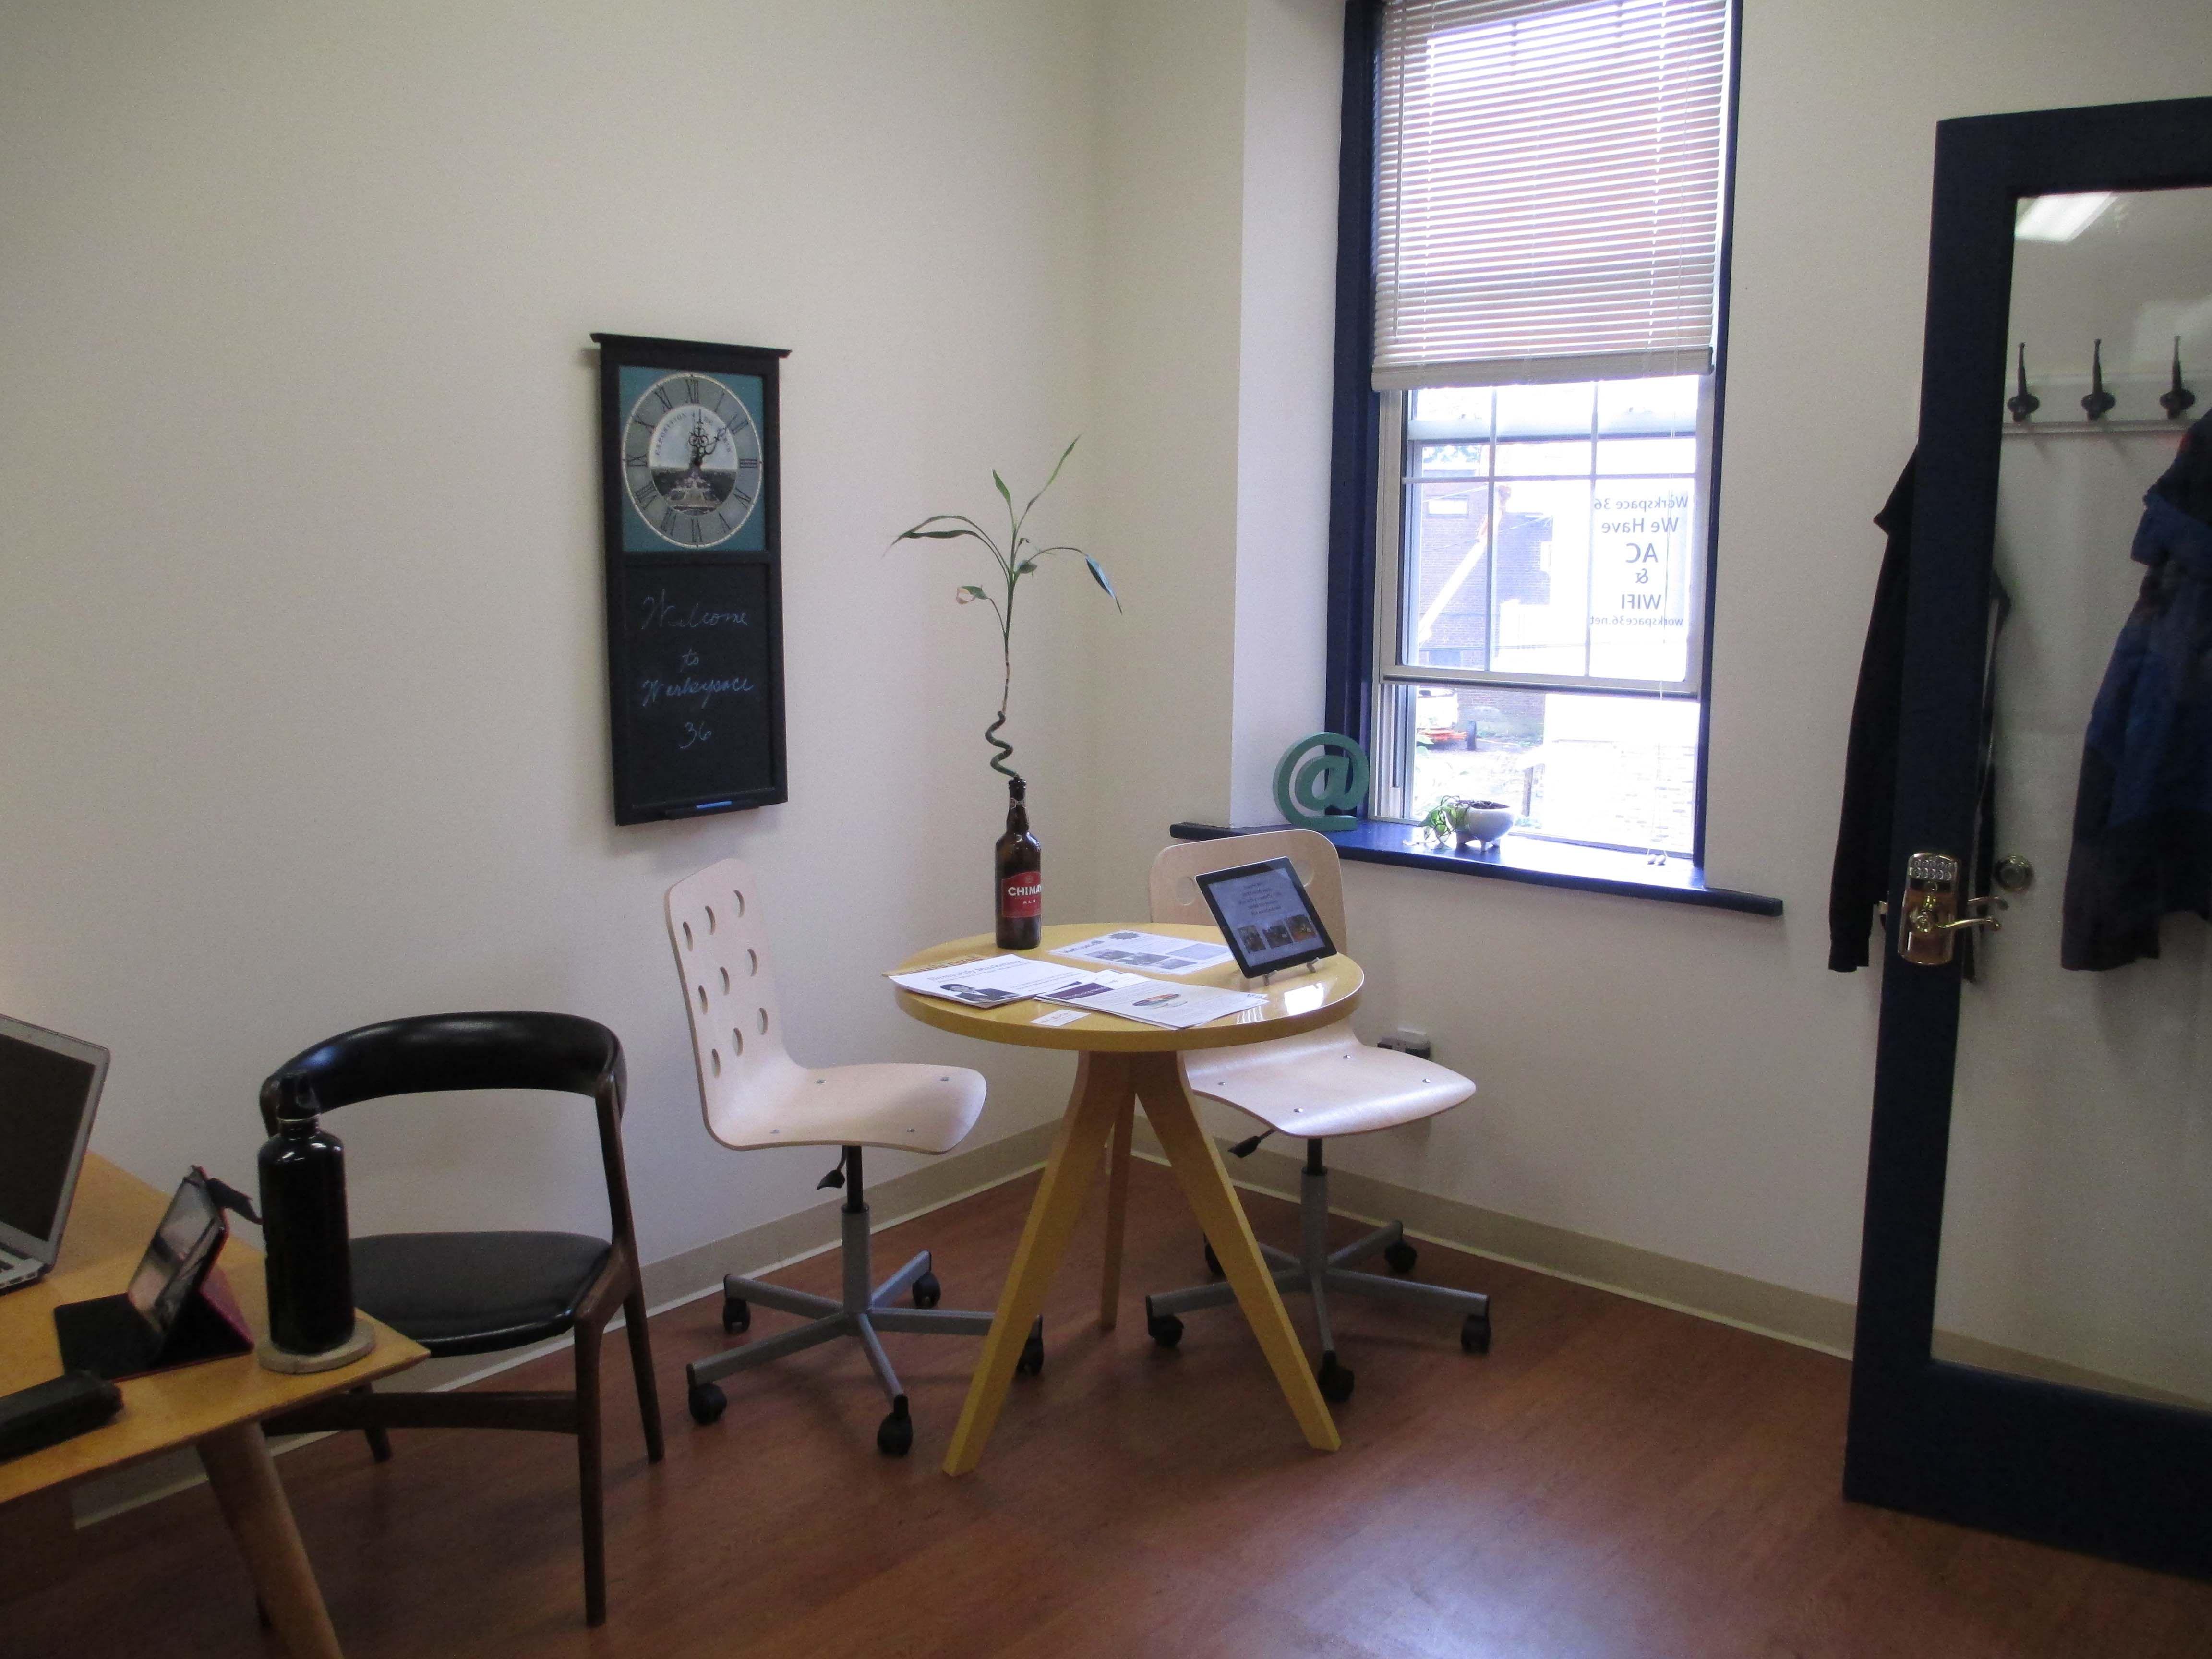 Office WorkspaceWorkspace 36 In Amesbury Massachusetts Creative Home Workspace Ideas With A Peculiar Geometric Exterior London Creativ